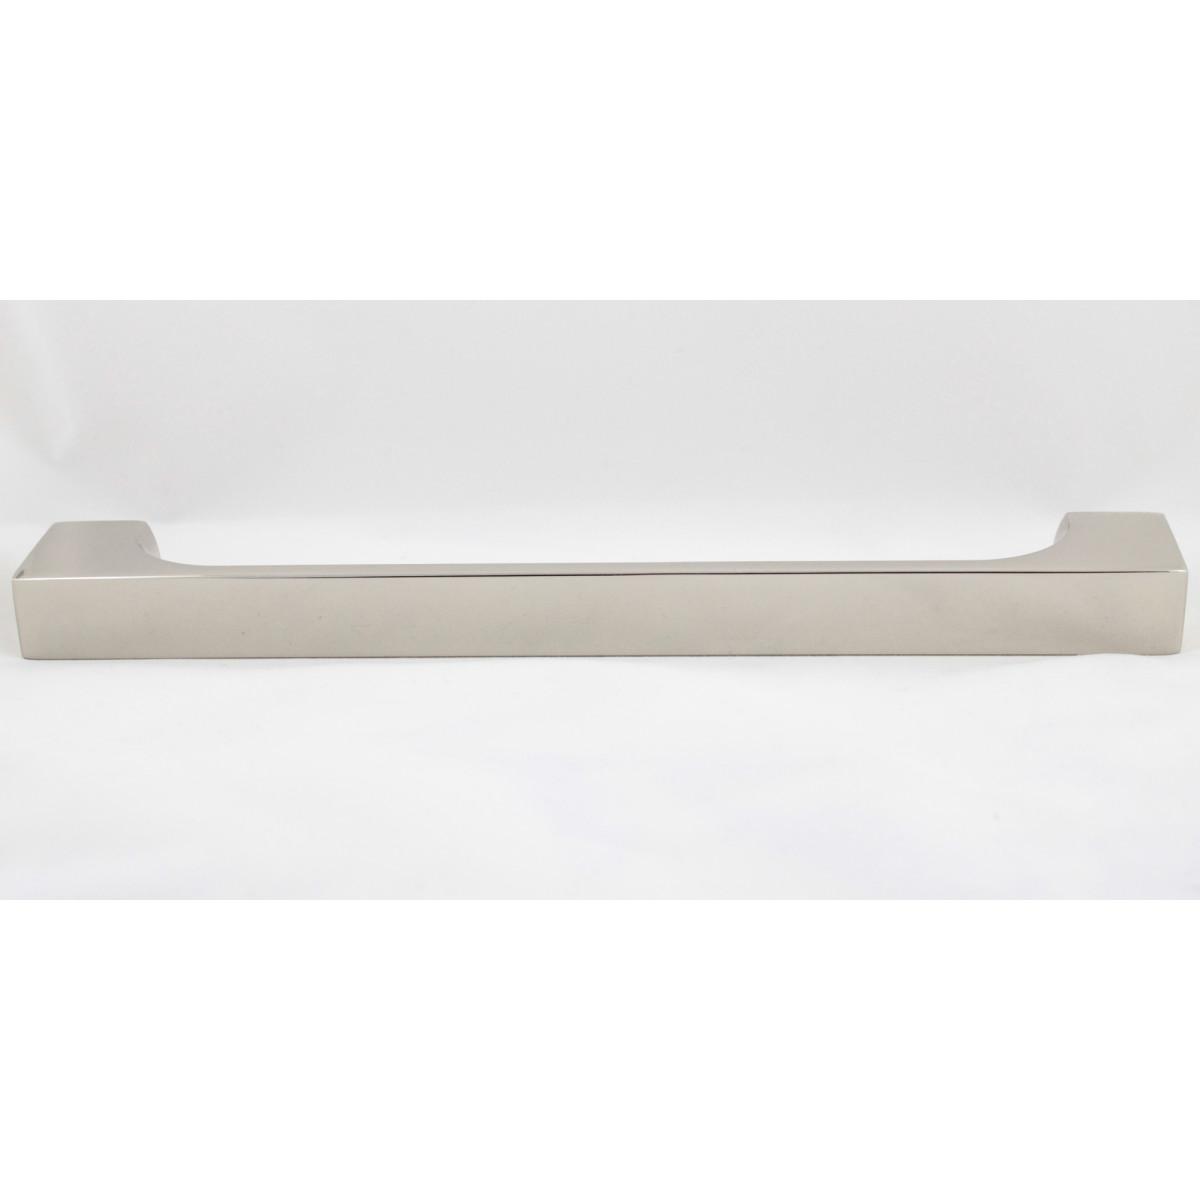 Ручка-Скоба Modda 320 Латунь Никель Pizza-830-41-320